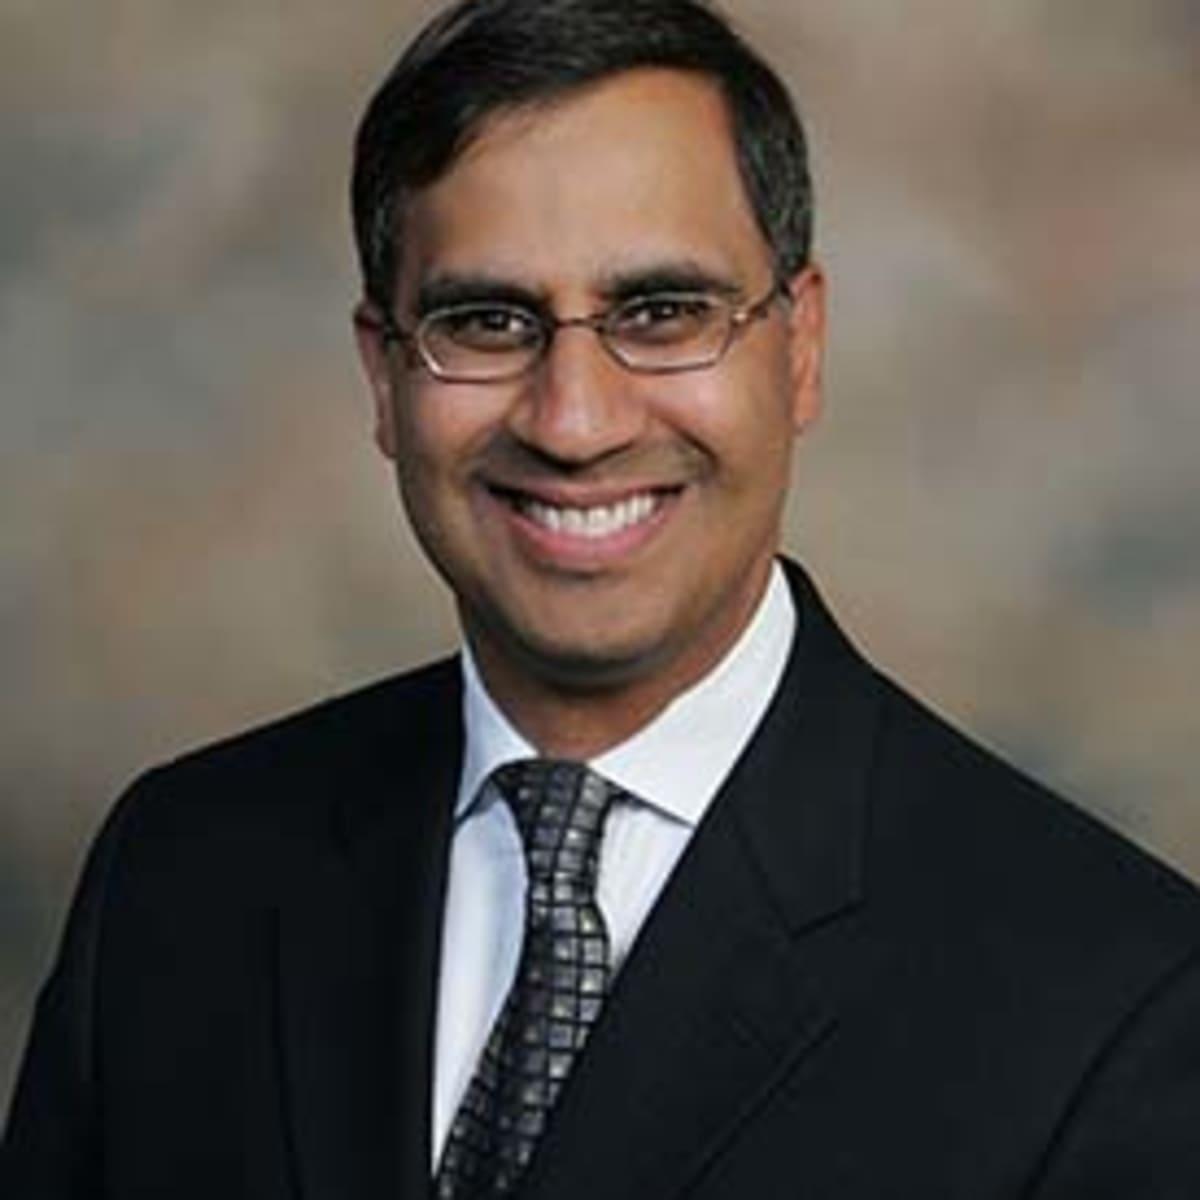 dr salil doshi md elmhurst il otolaryngologist